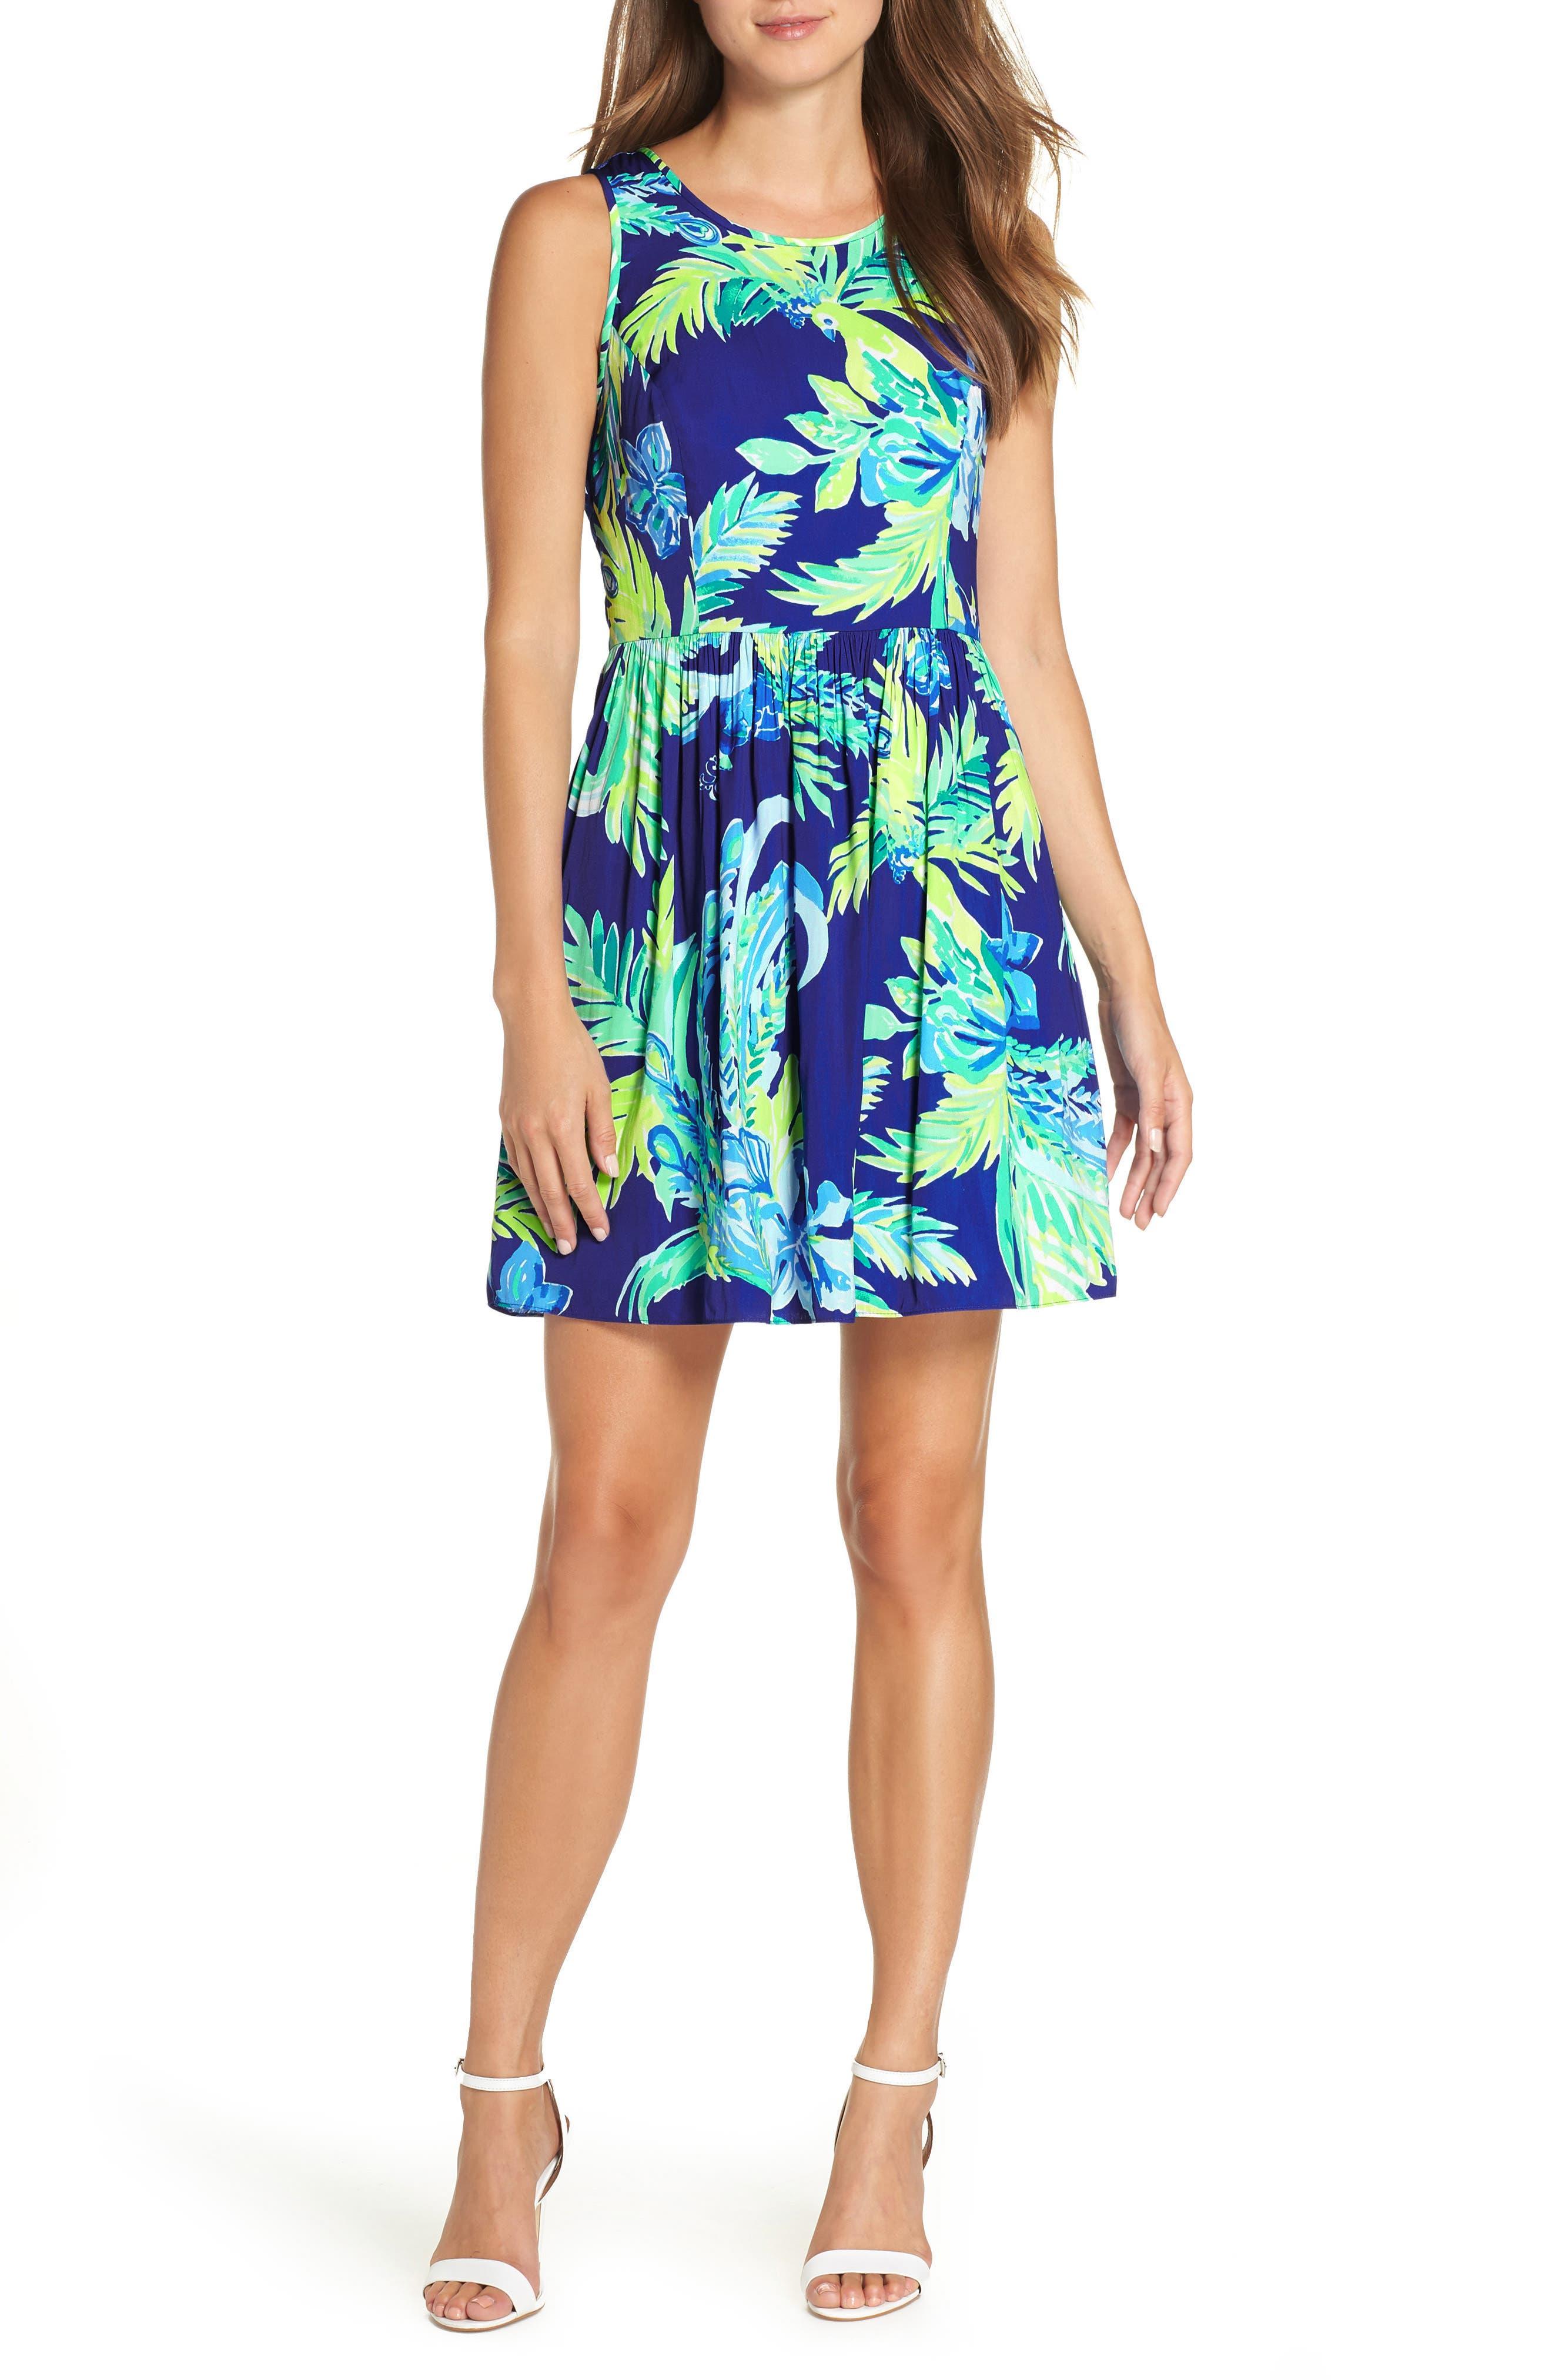 Lilly Pulitzer Kassia Fit & Flare Dress